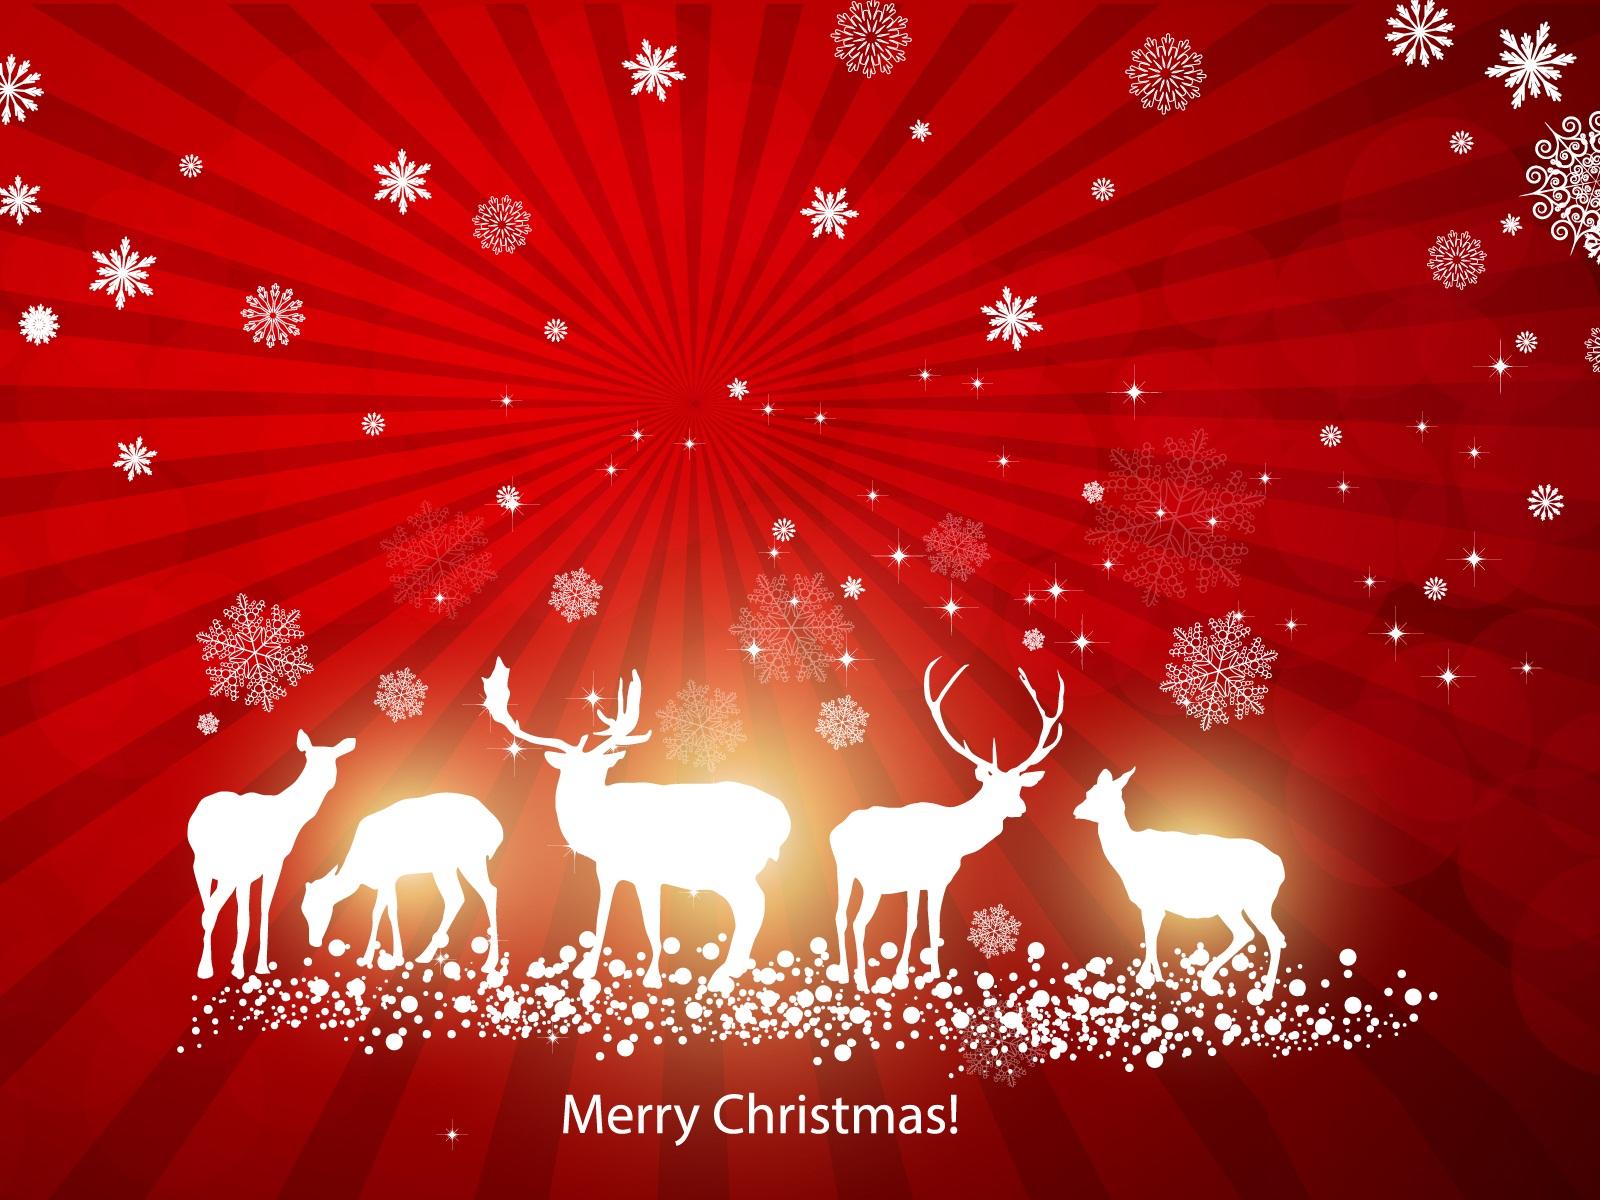 Christmas screensavers wallpaper wallpapersafari - Free 3d christmas screensavers ...